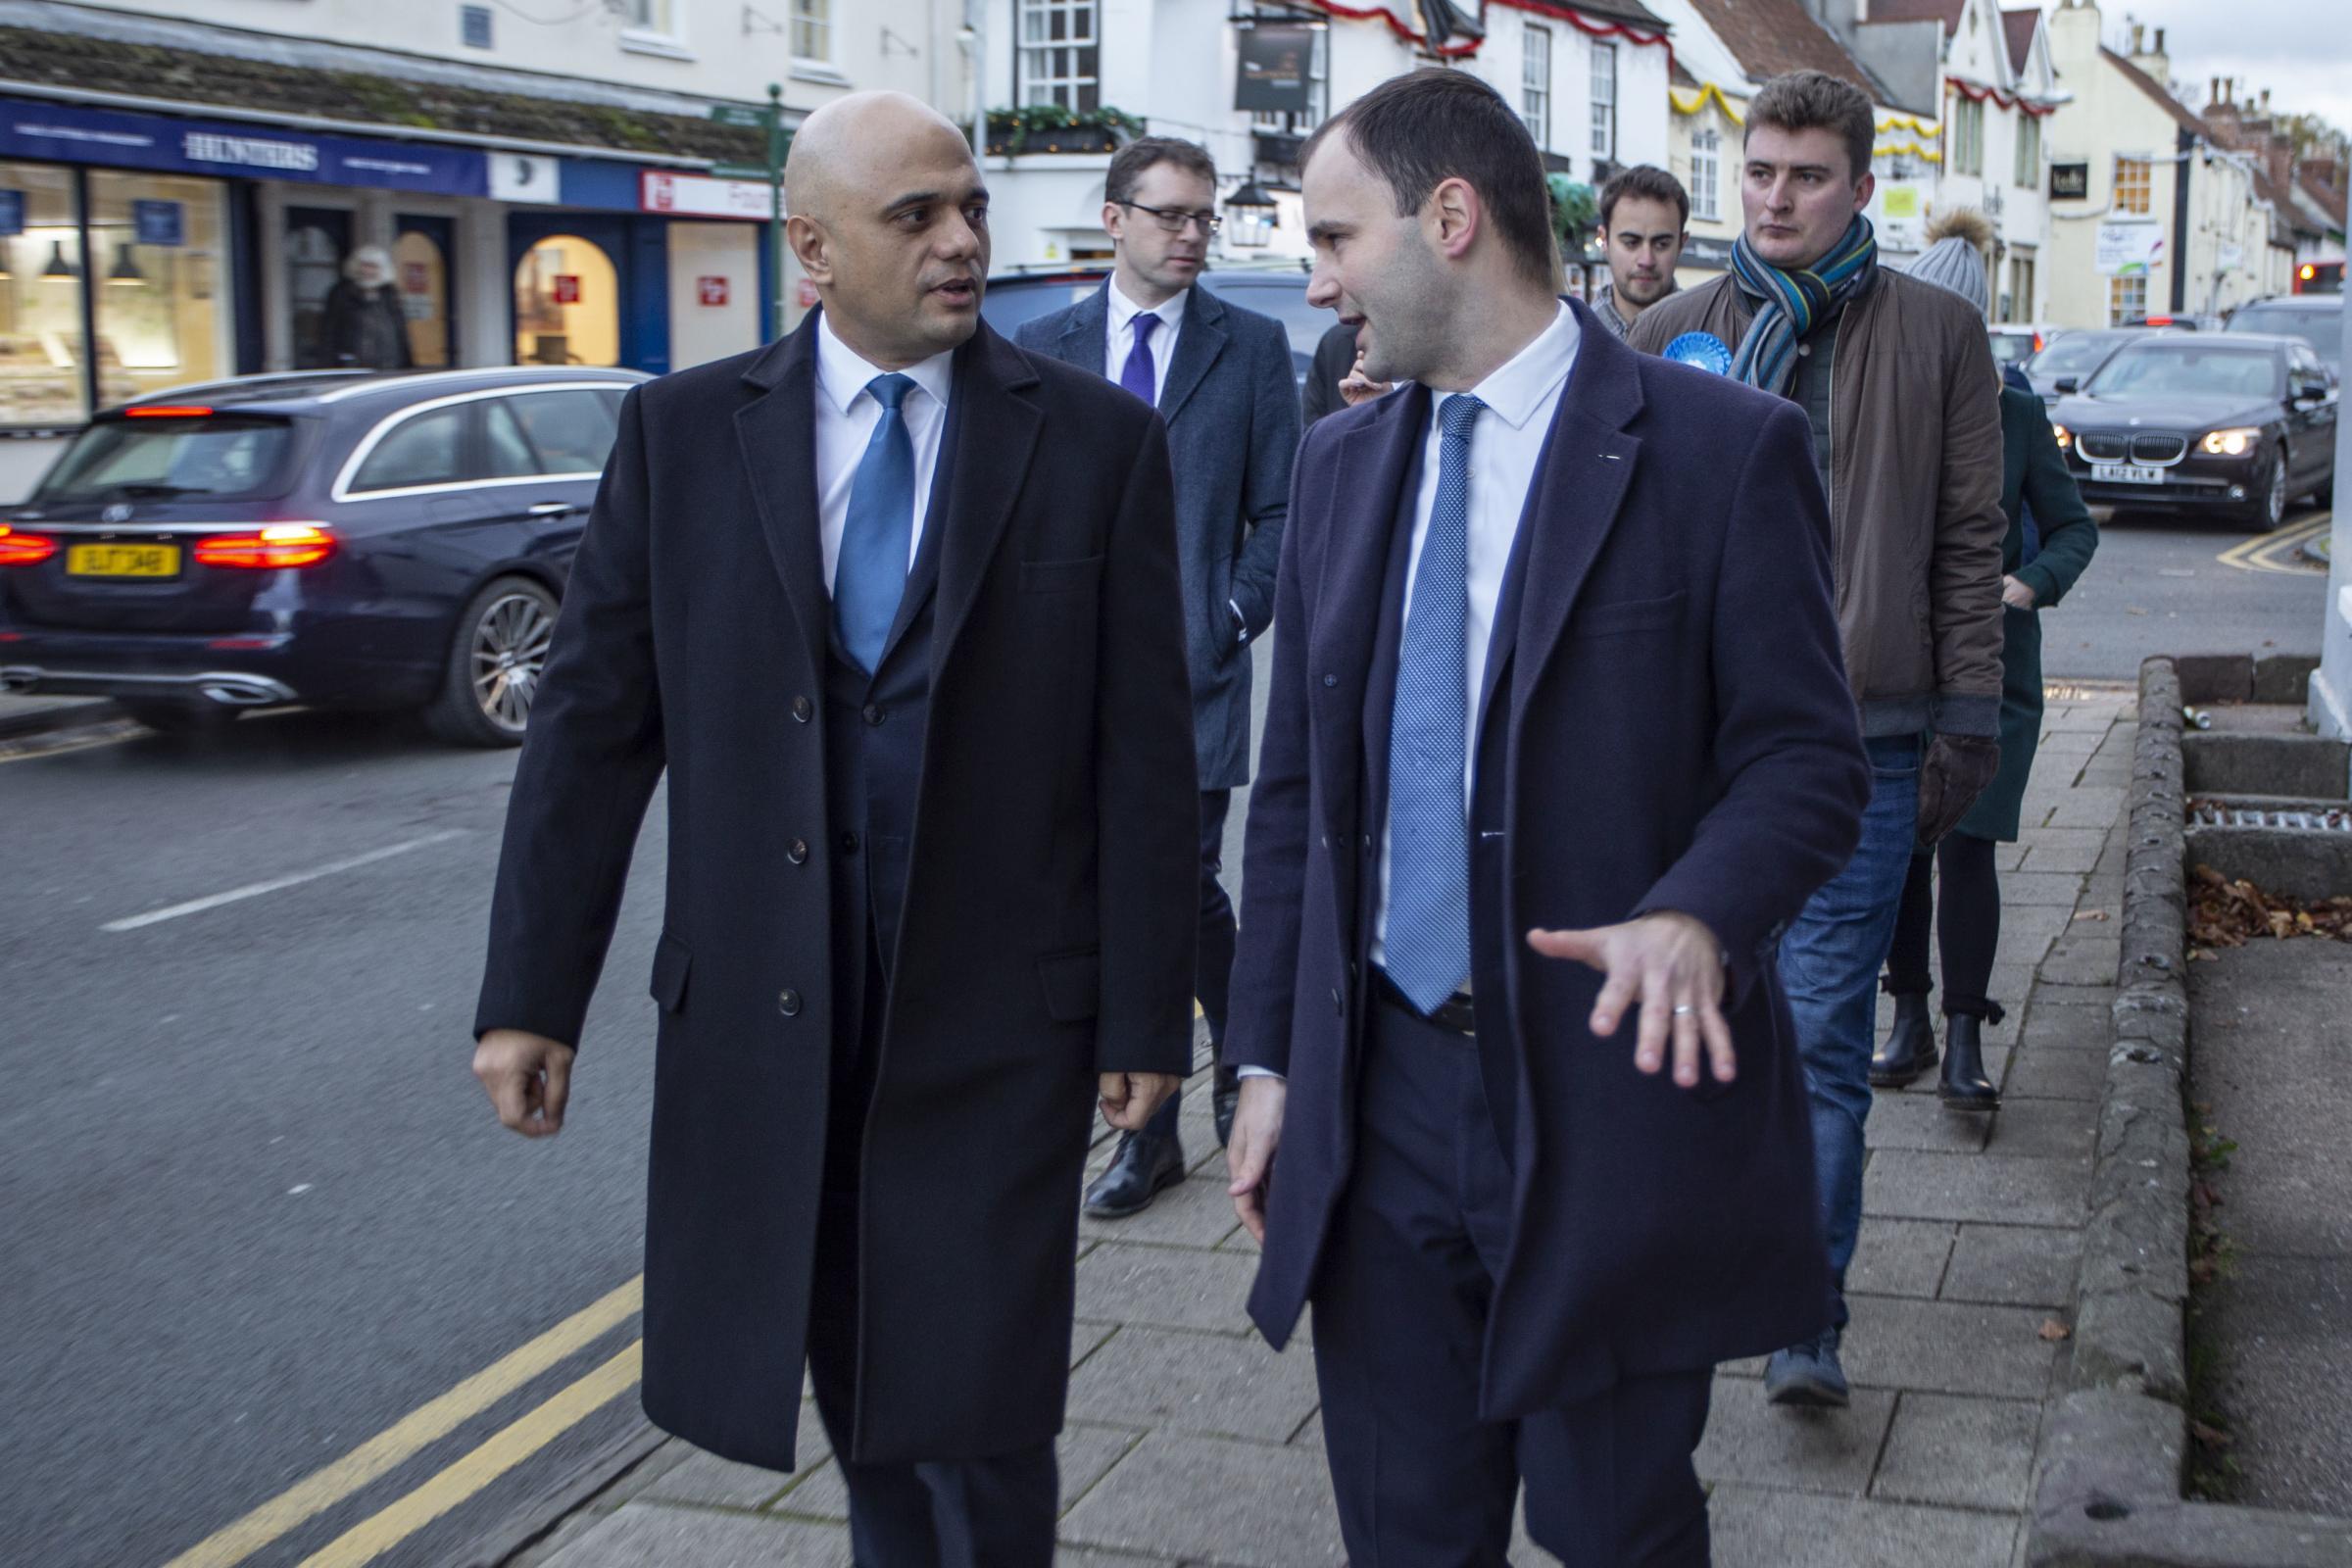 WATCH: Chancellor Sajid Javid talks South Gloucestershire on visit to Thornbury High Street - Gazette Series